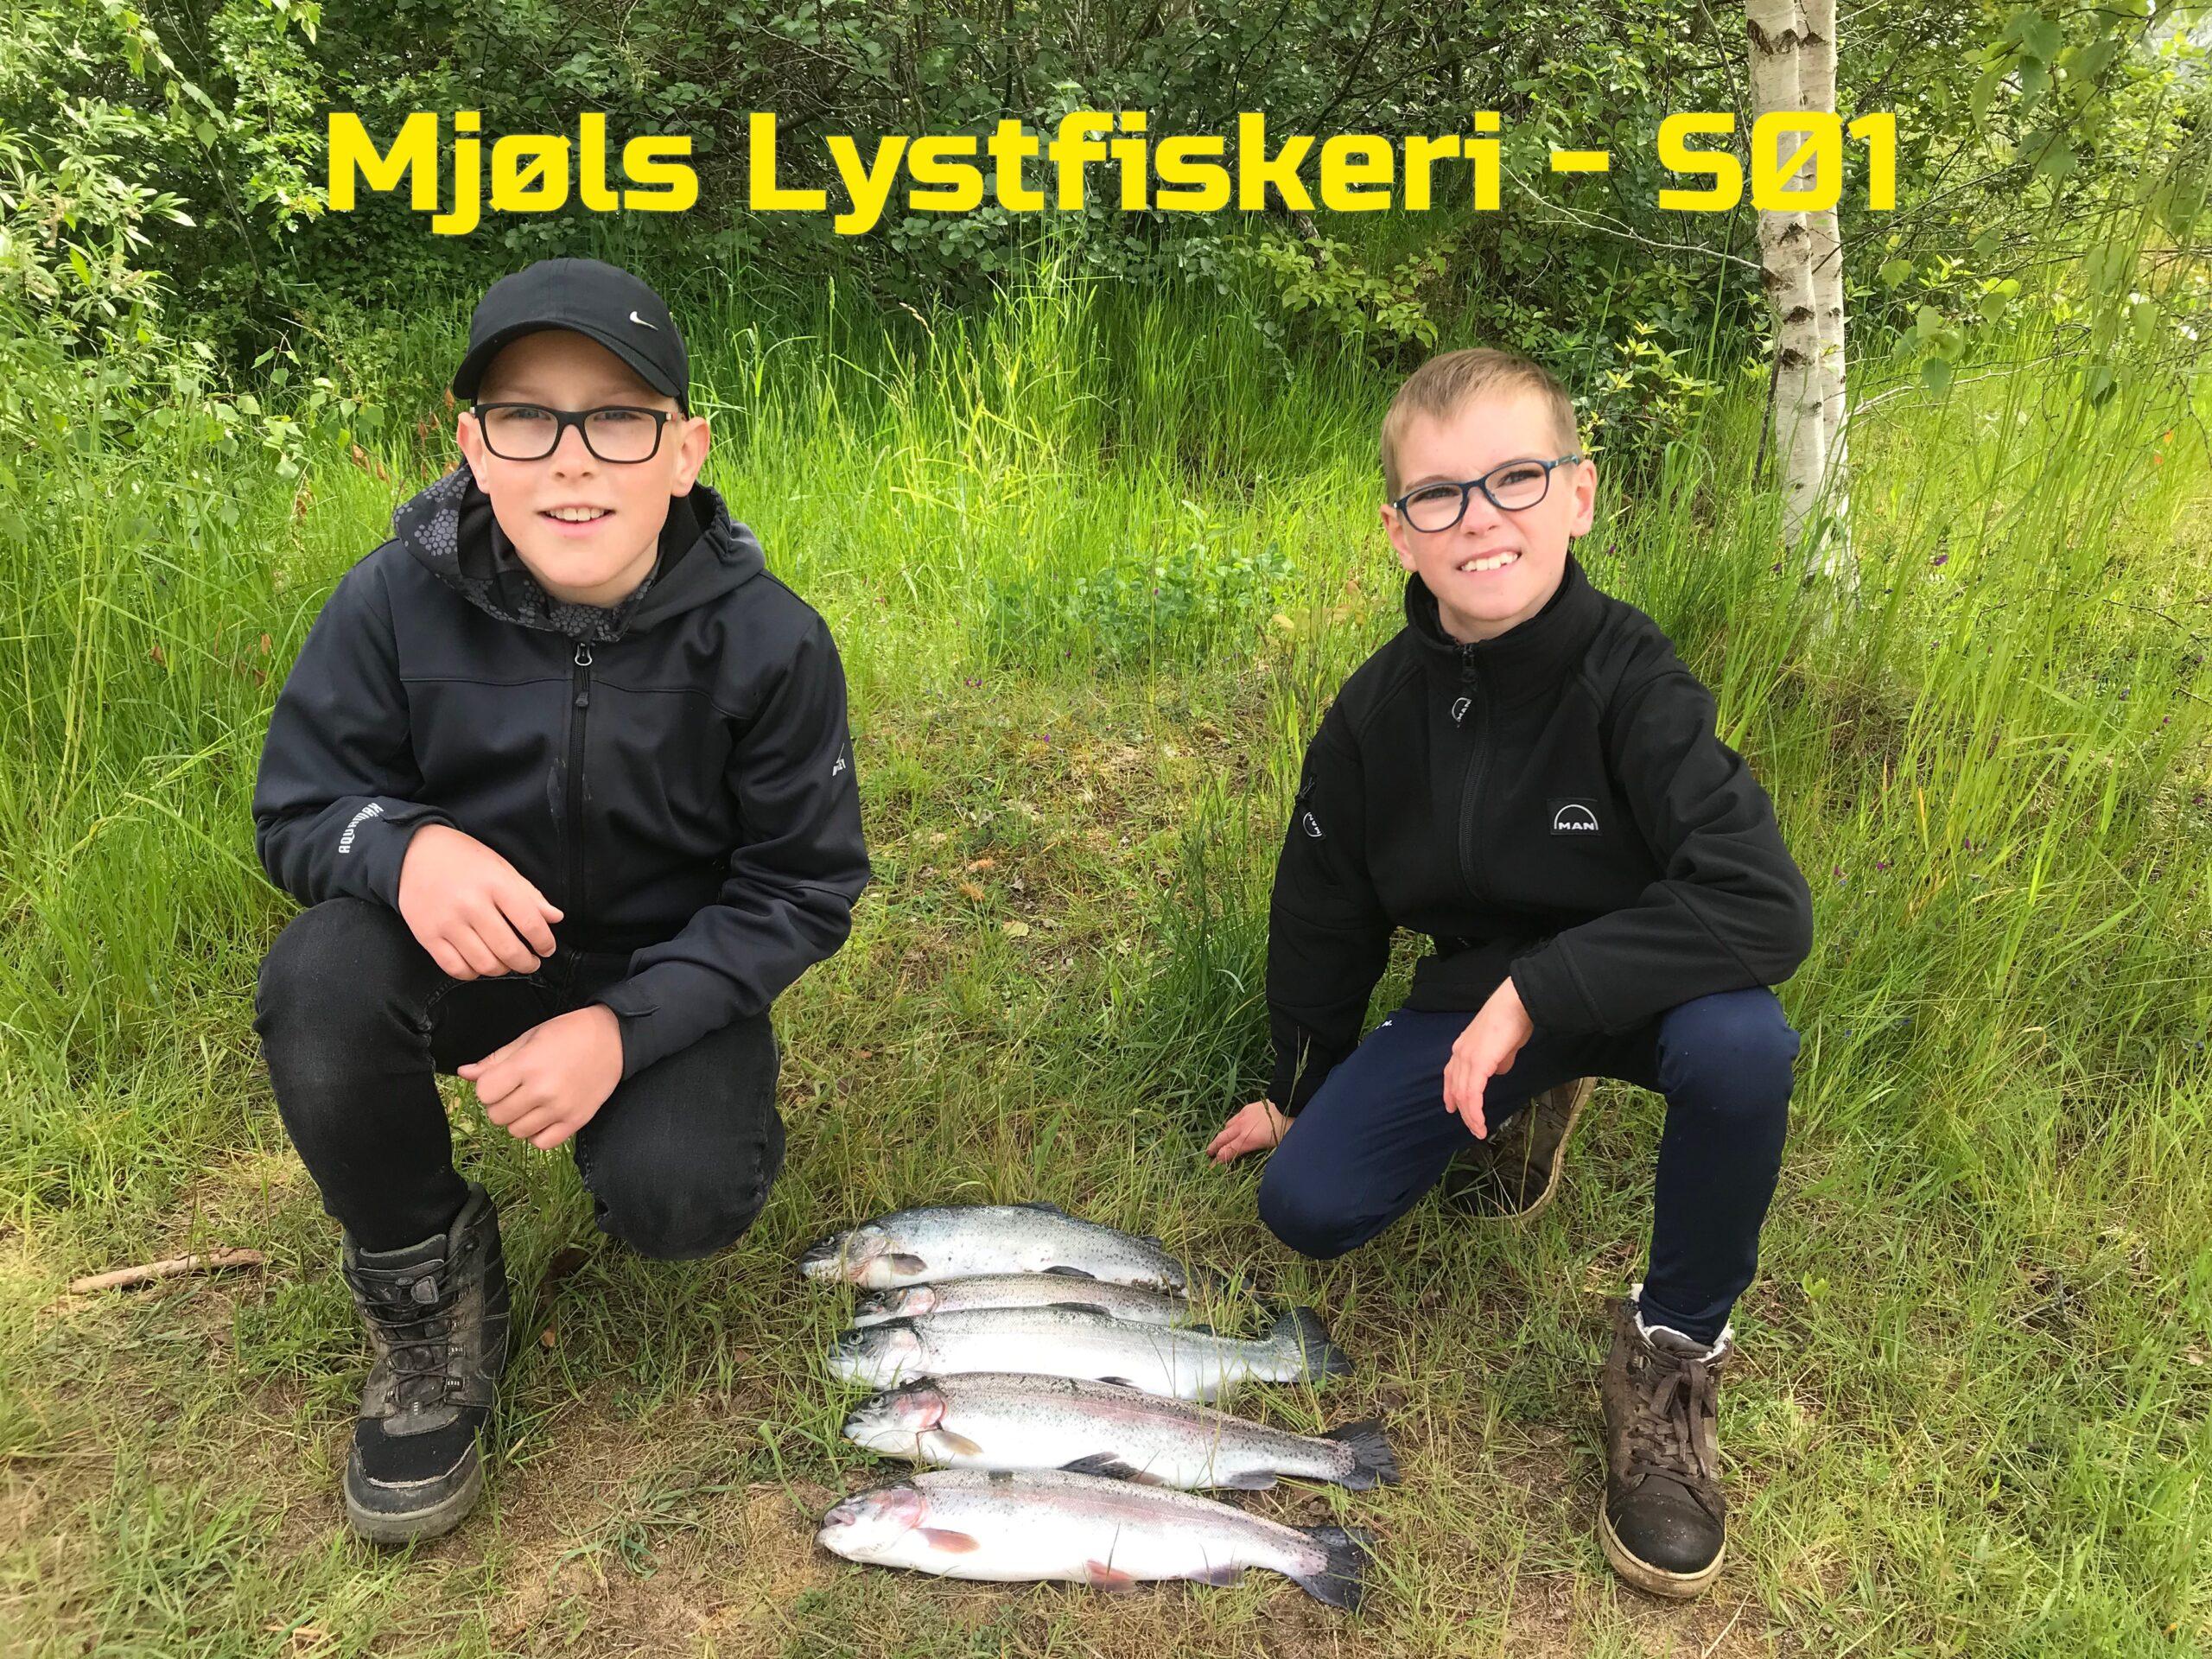 Mjøls Lystfiskeri: De fik Full House søndag formiddag